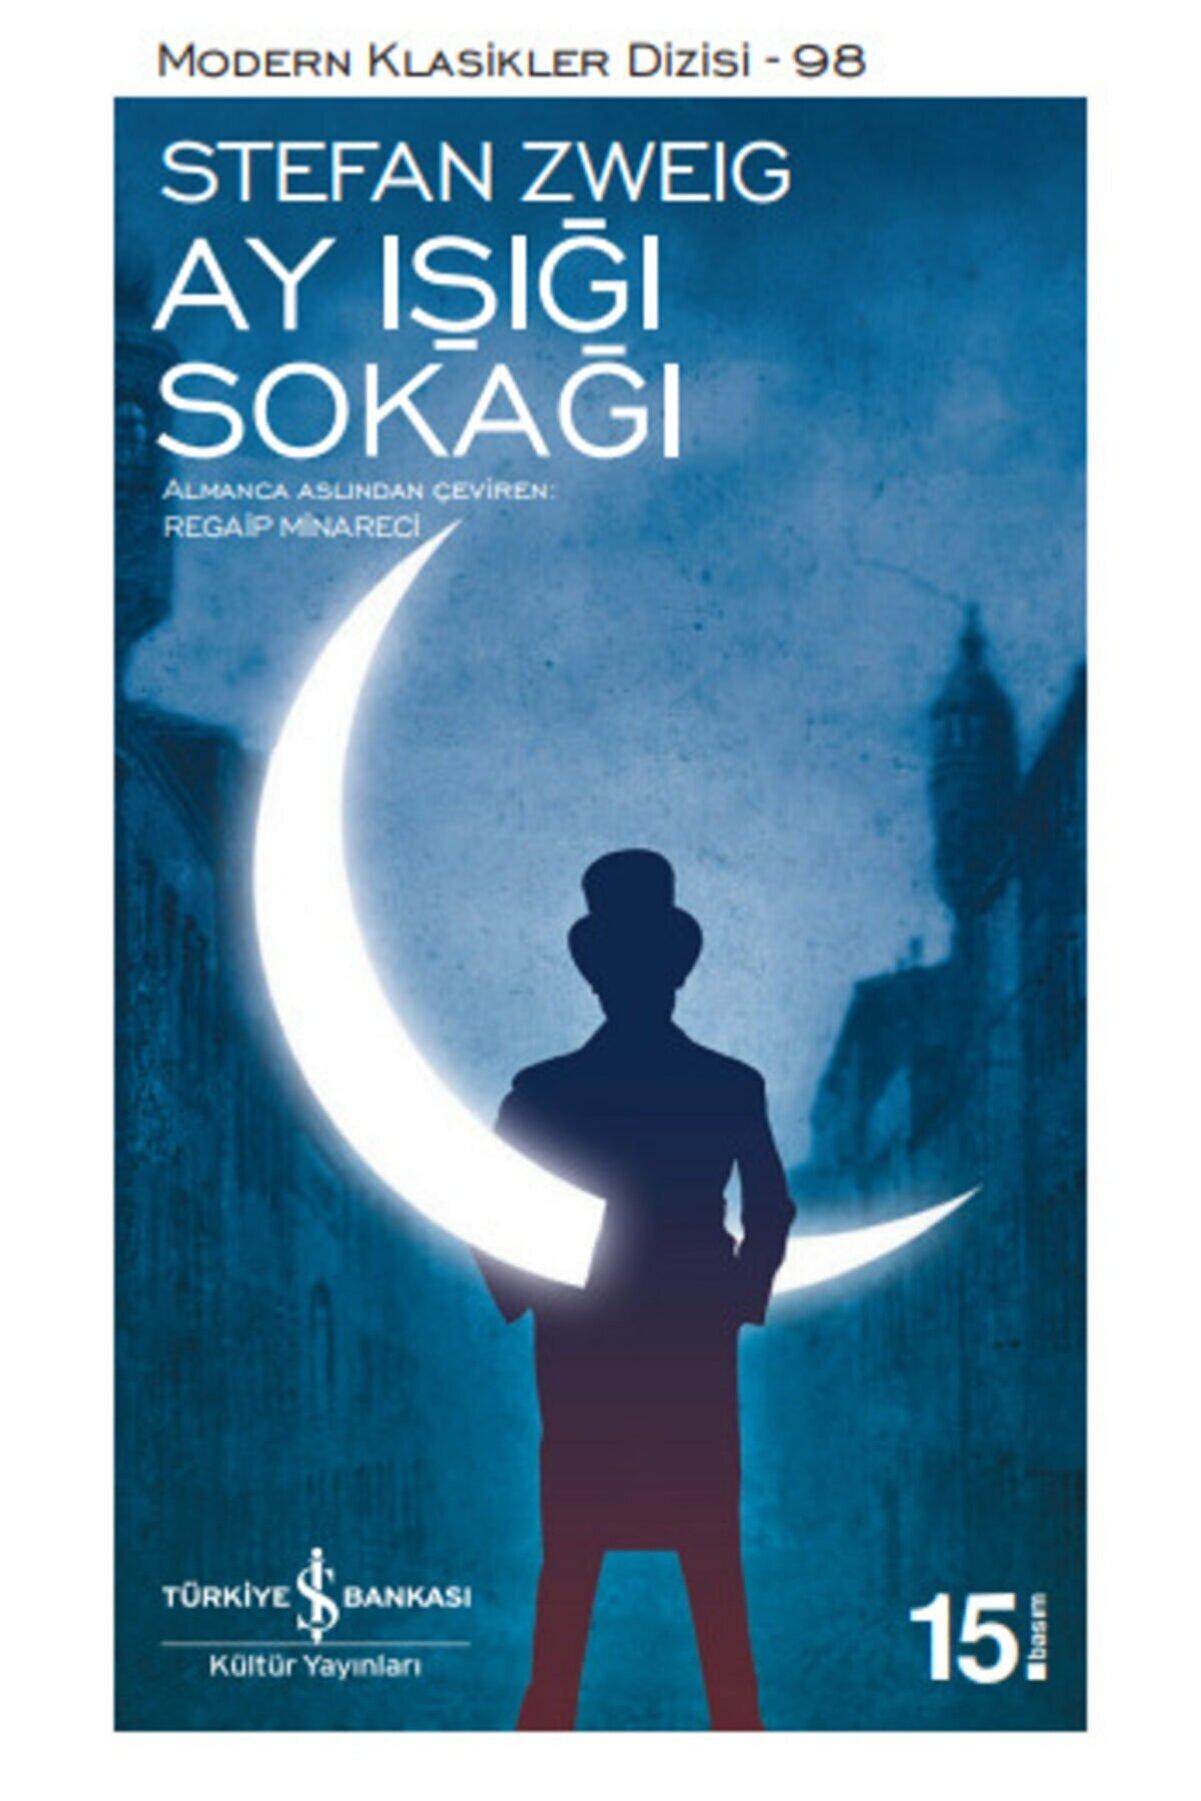 İş Bankası Kültür Yayınları Ay Işığı Sokağı - Stefan Zweig